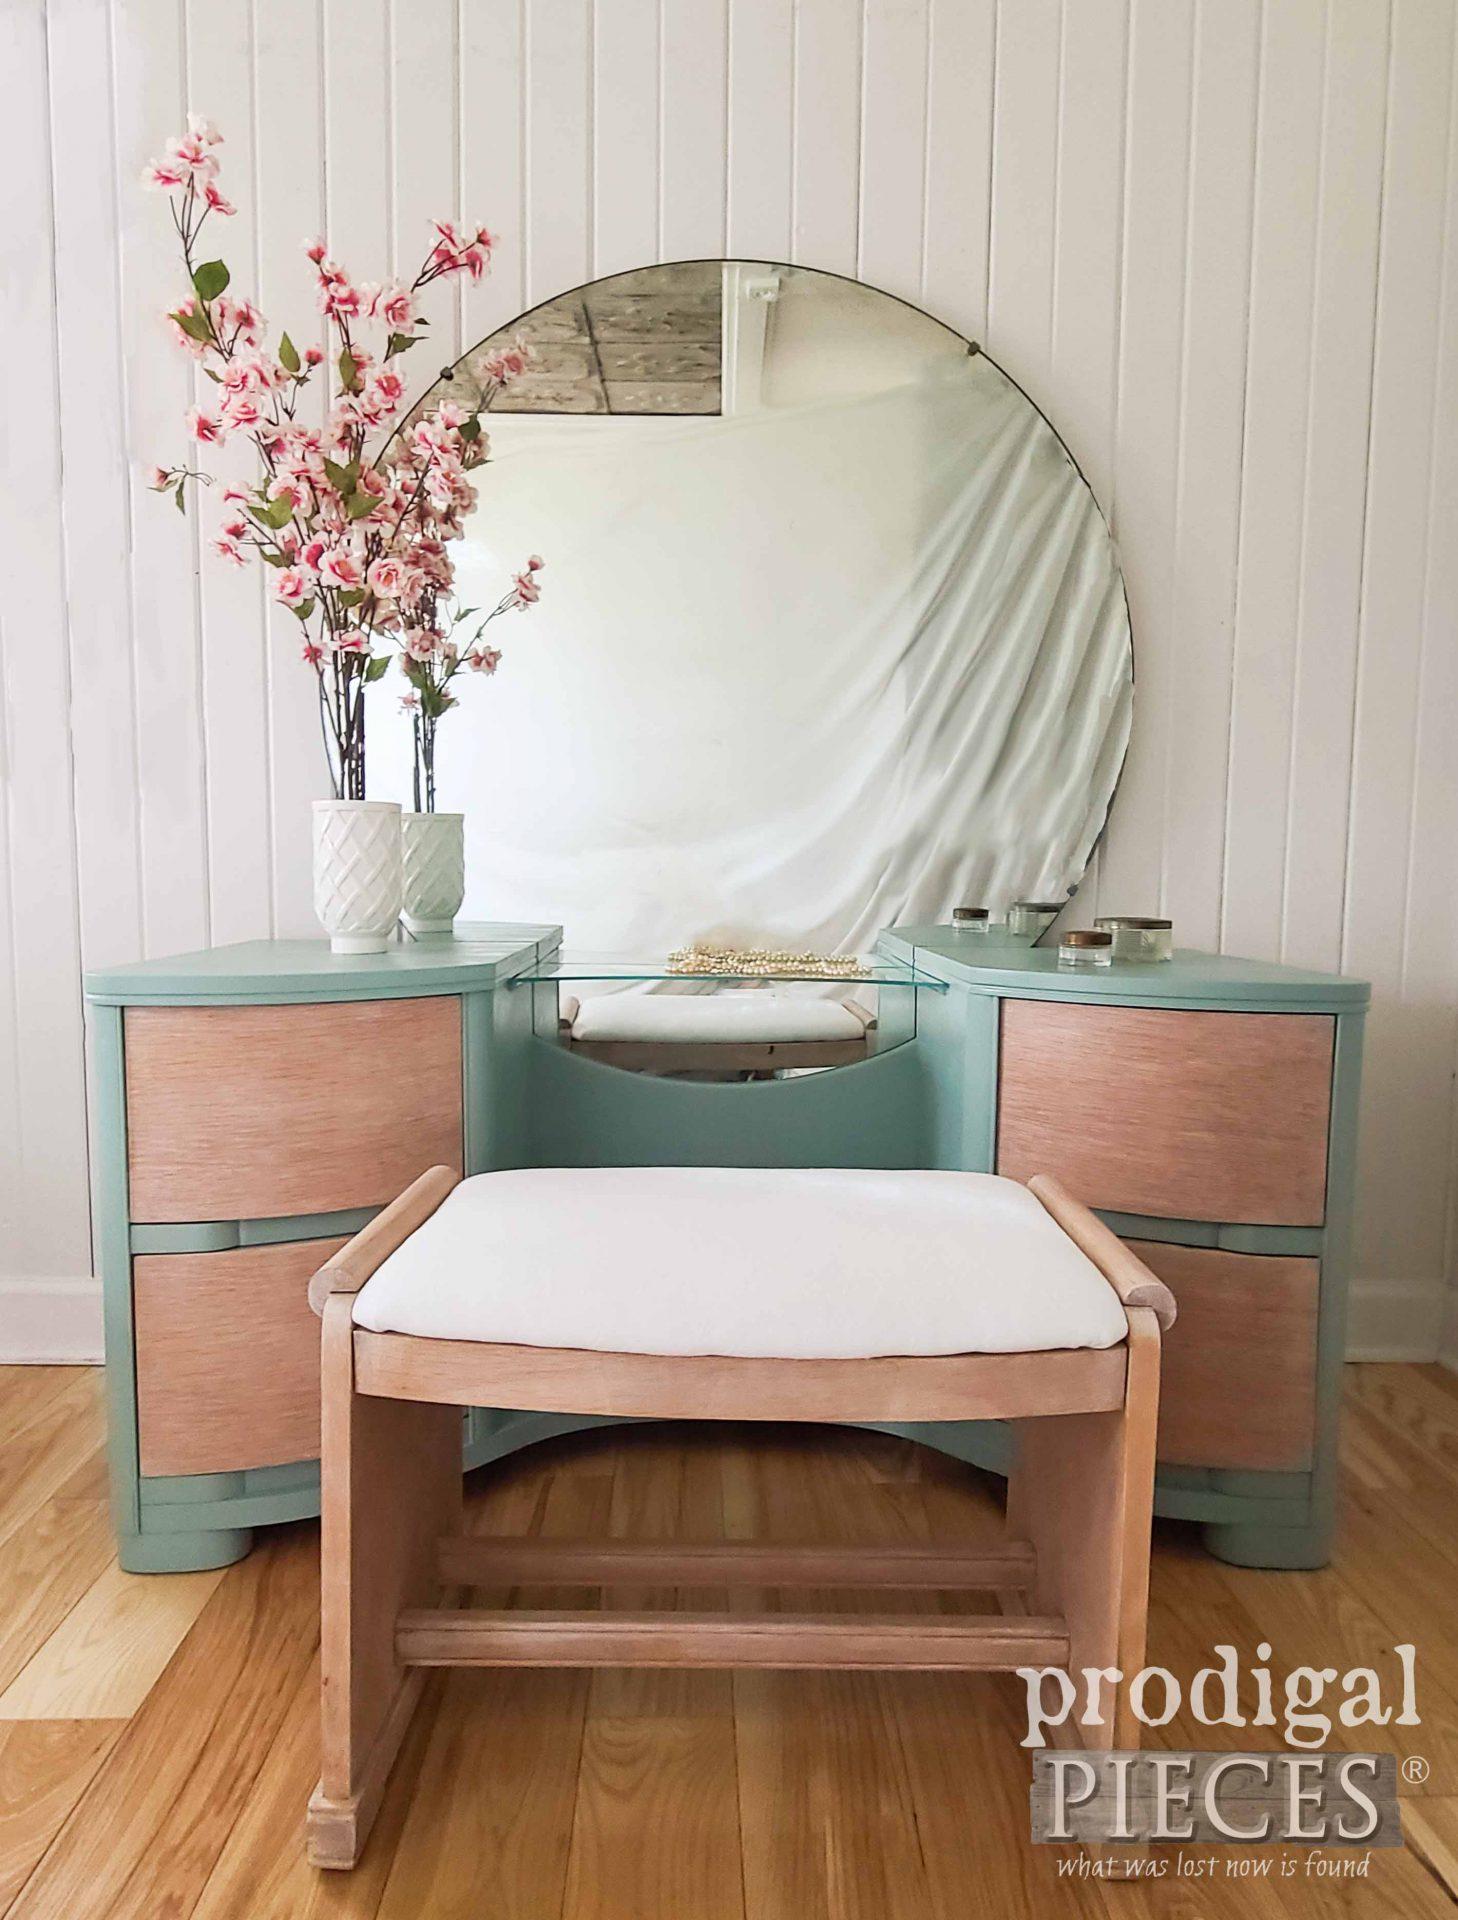 Vintage Art Deco Dressing Table Reveal by Larissa of Prodigal Pieces | prodigalpieces.com #prodigalpieces #furniture #home #artdeco #vintage #diy